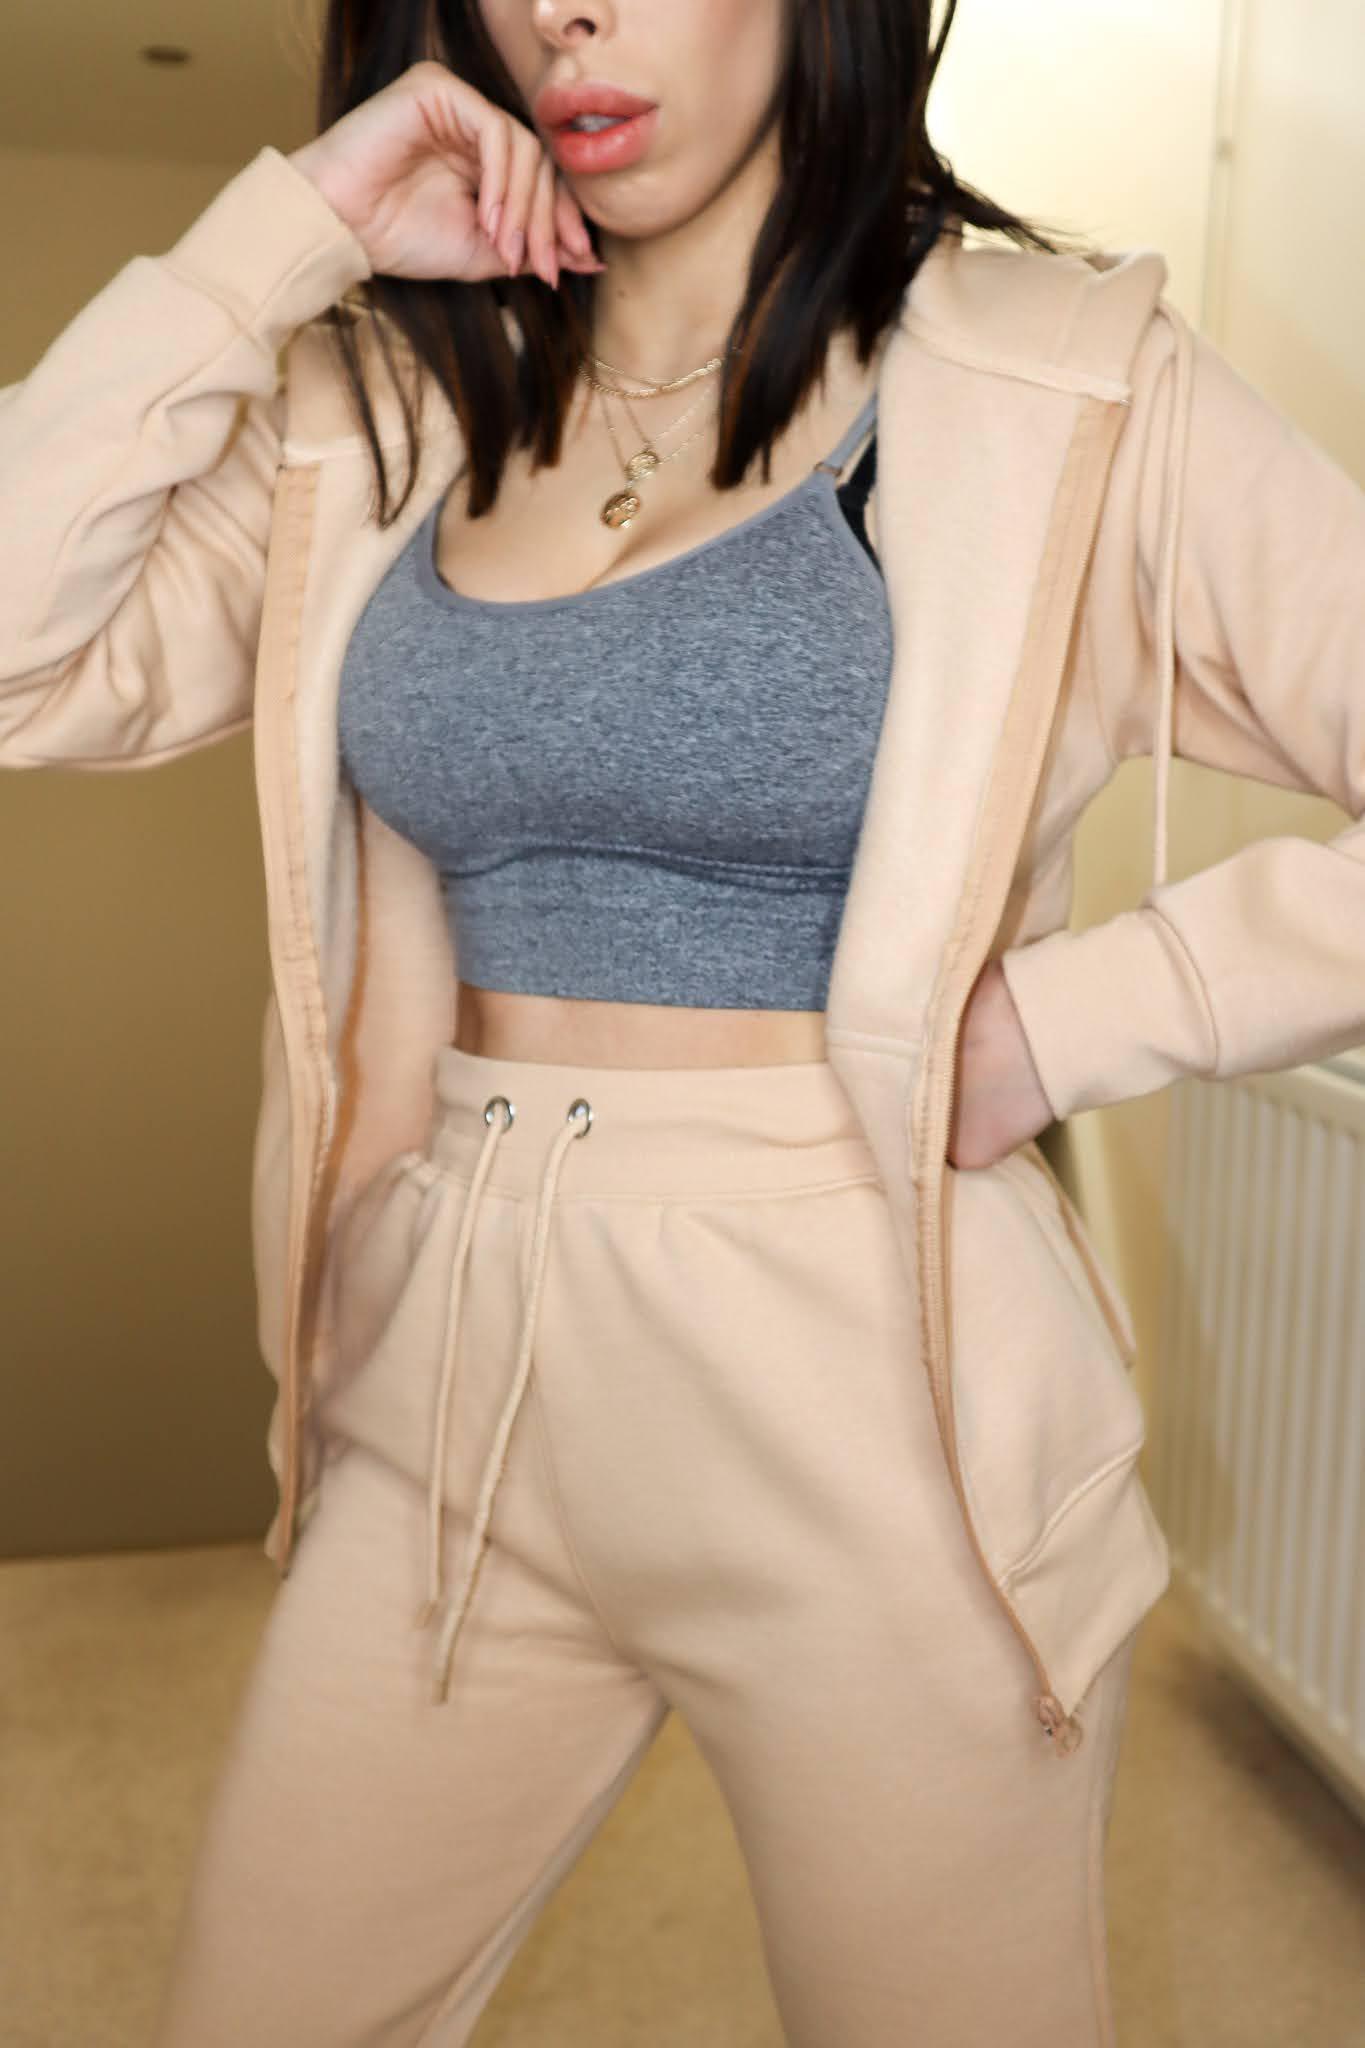 The Femme Luxe Stone Oversized Zip Up Hoodie Cuffed Joggers Loungewear Set in model Pam